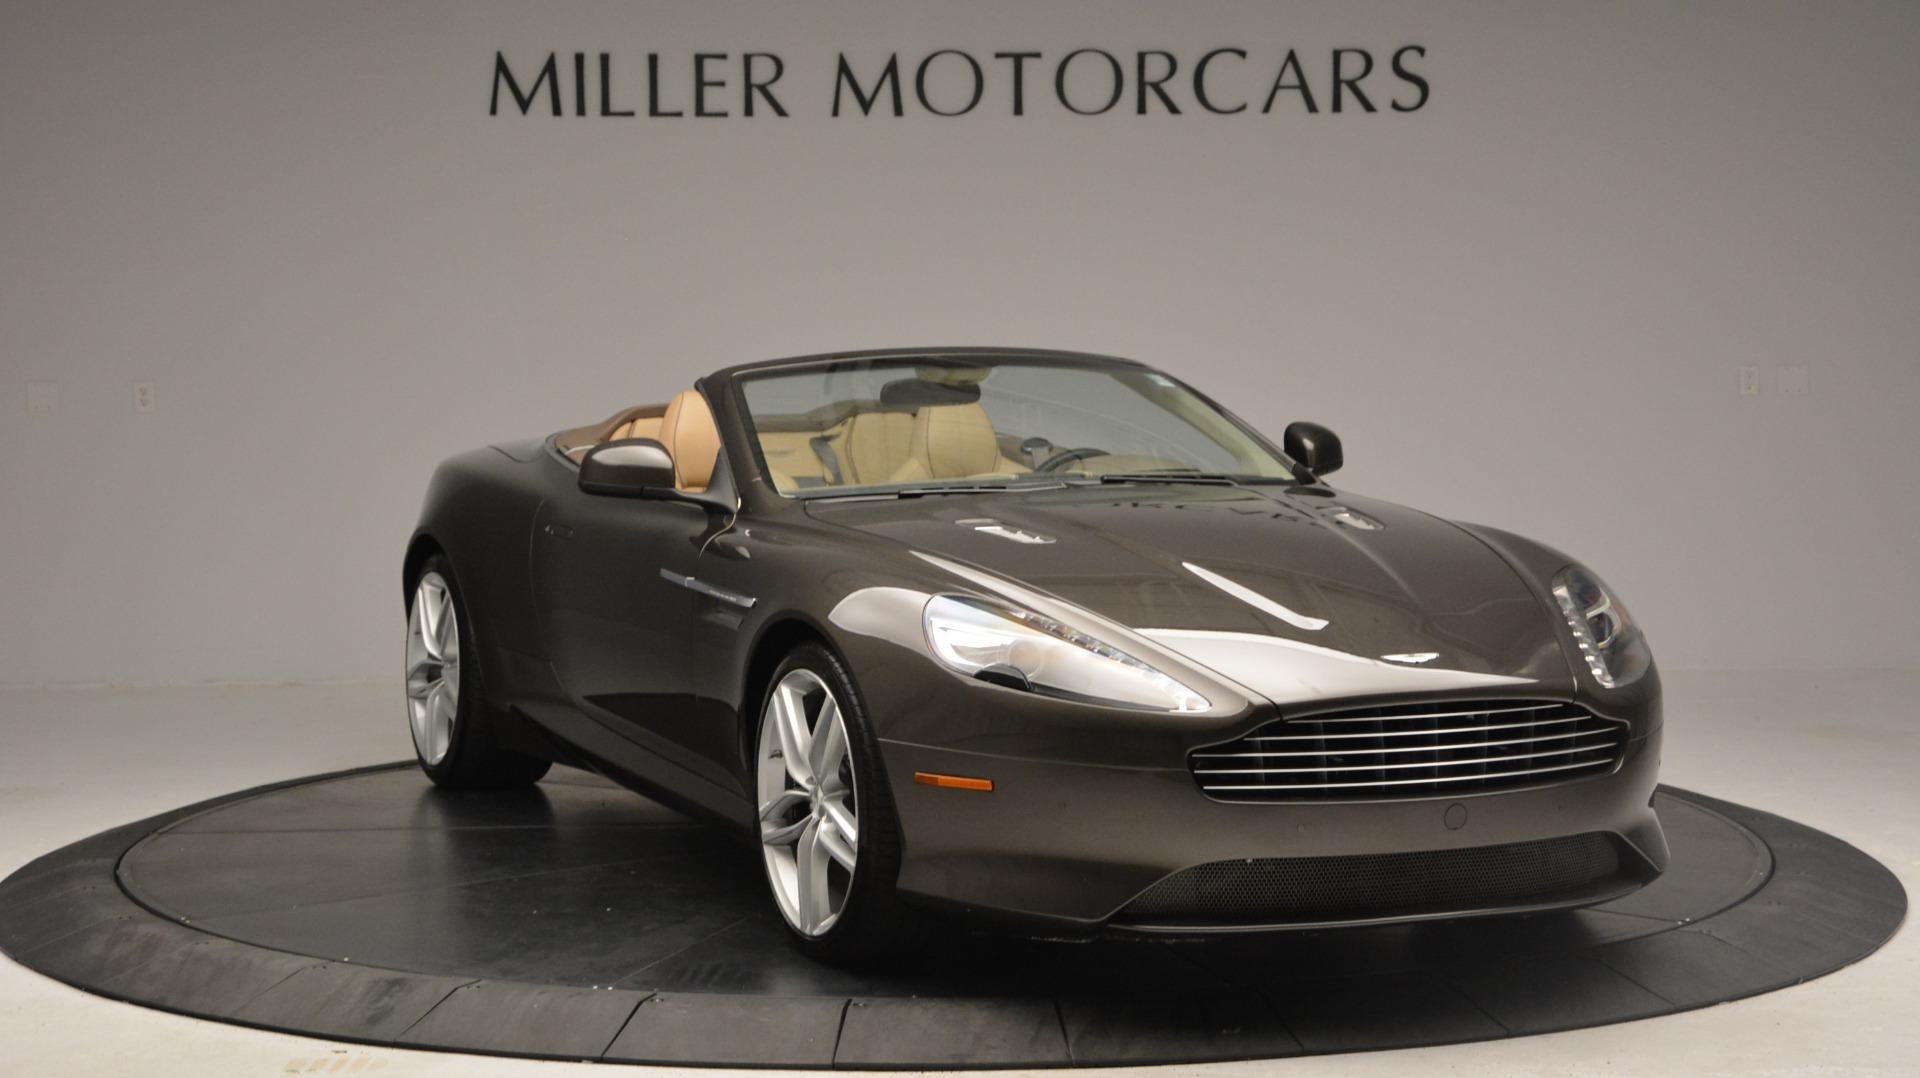 Used 2012 Aston Martin Virage Convertible For Sale In Greenwich, CT. Alfa Romeo of Greenwich, 7613 3351_p11